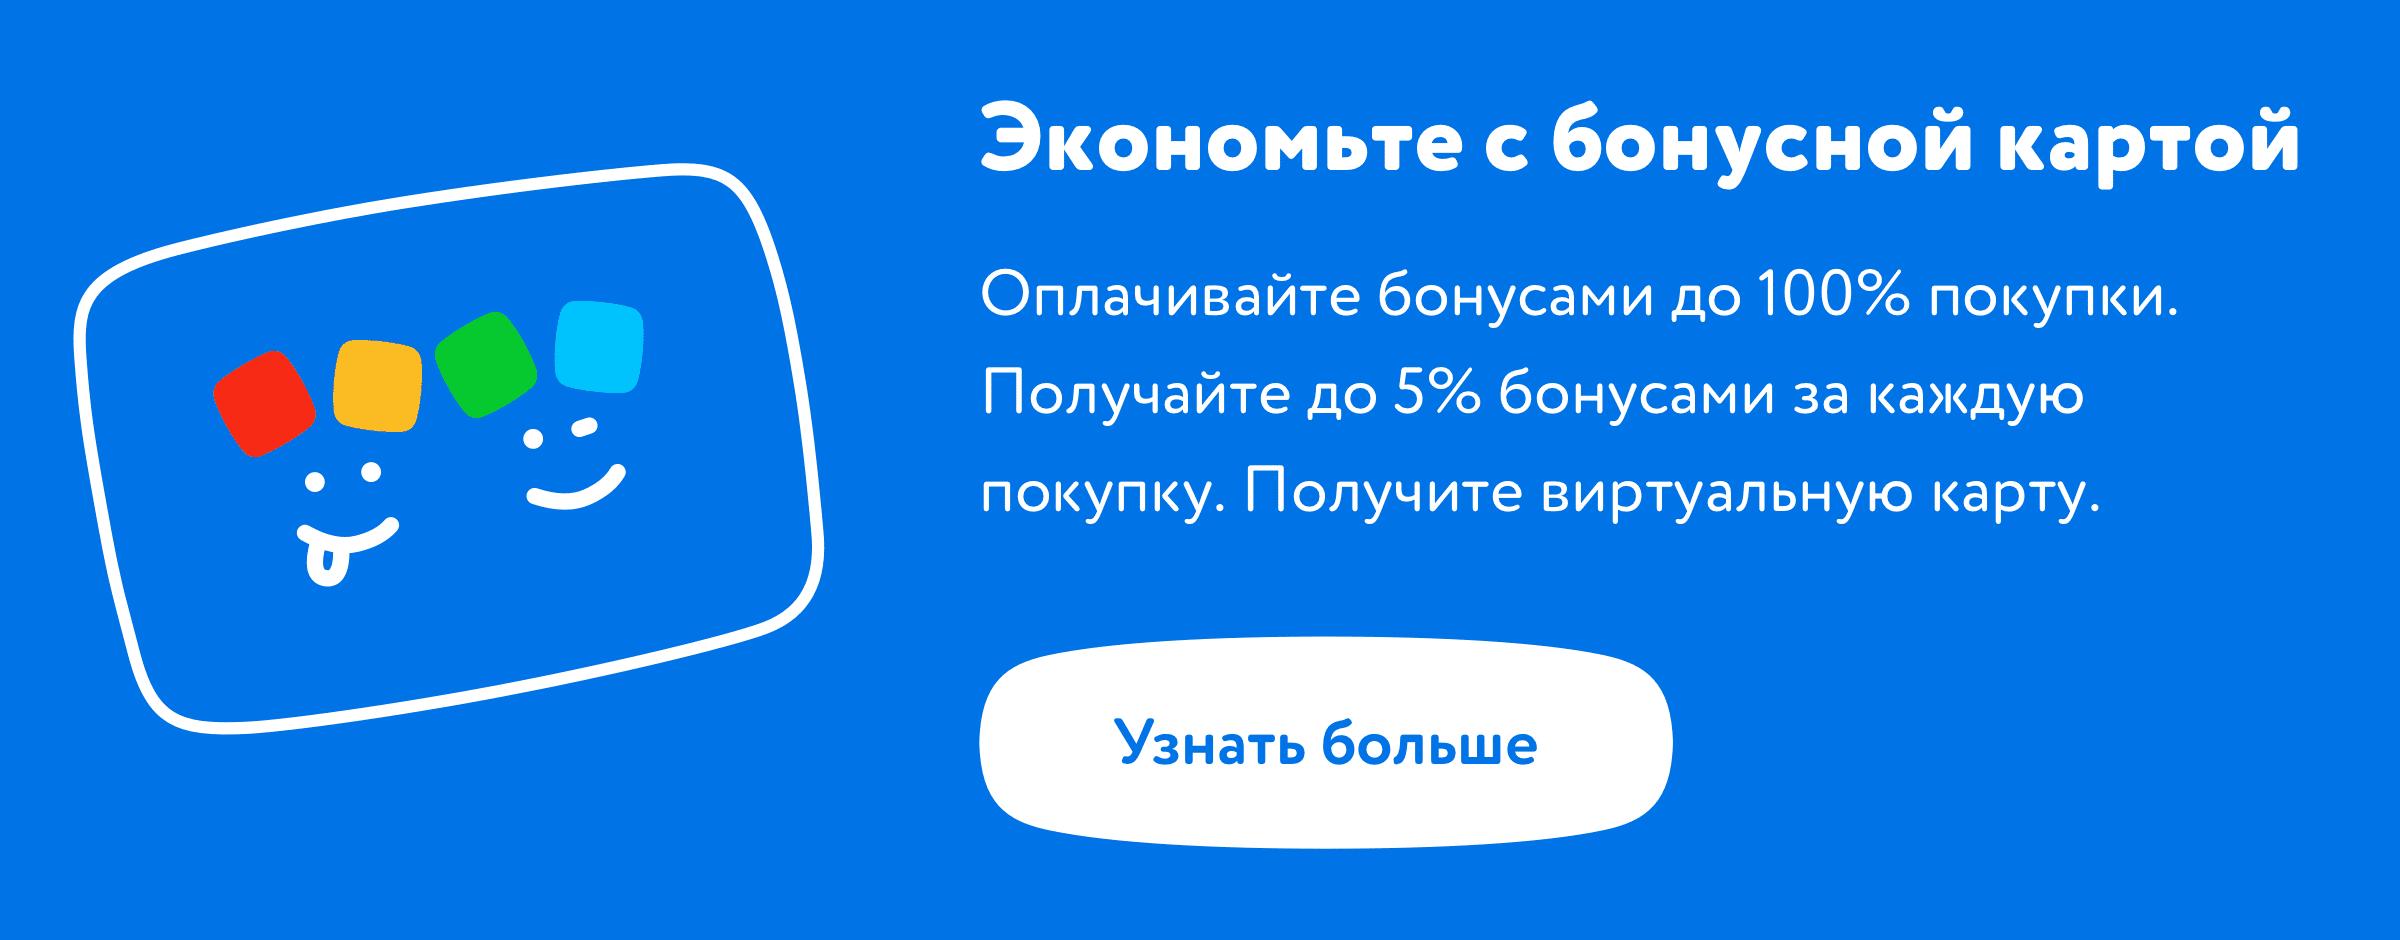 Бонусная карта Заглушка